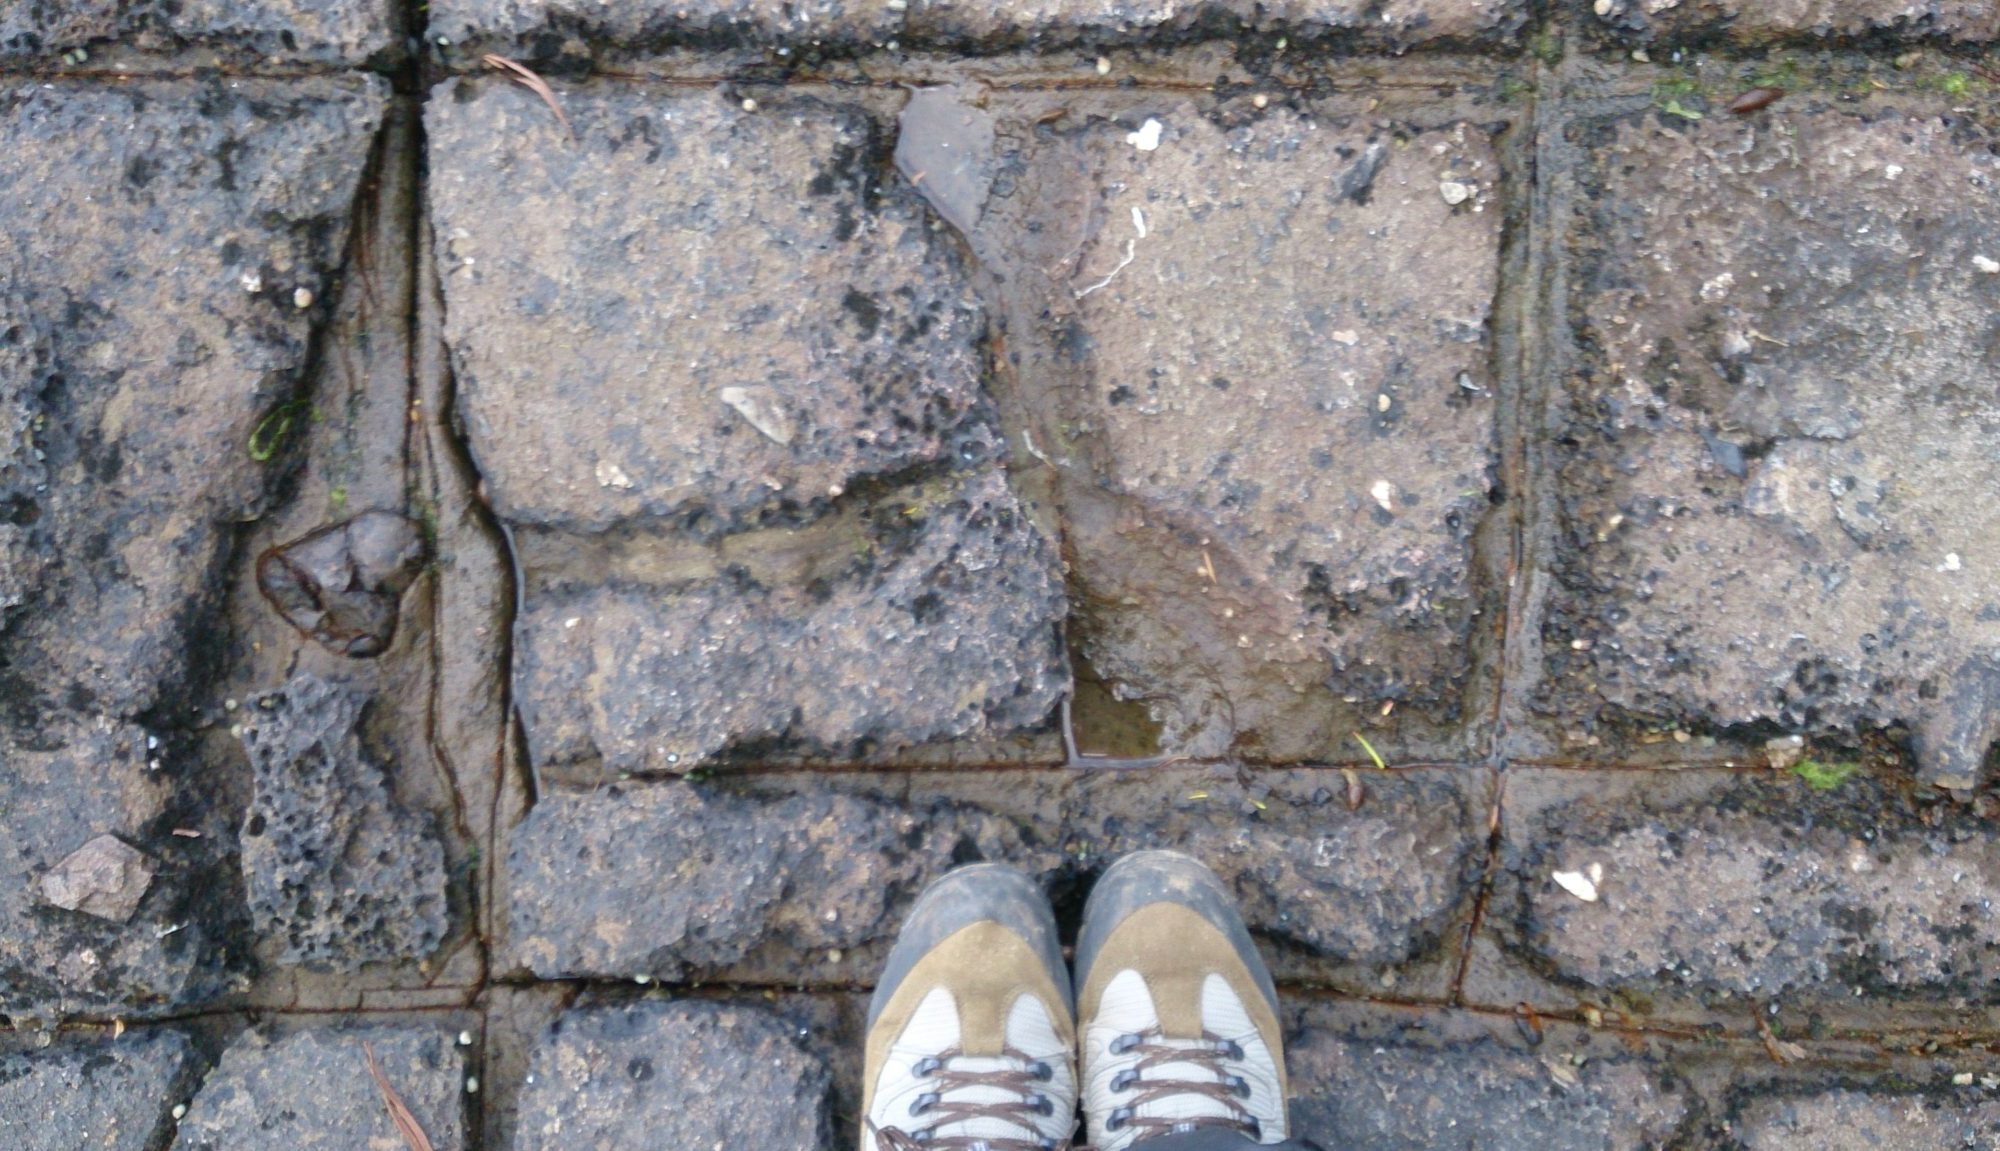 Traversing the Tessellated Pavement